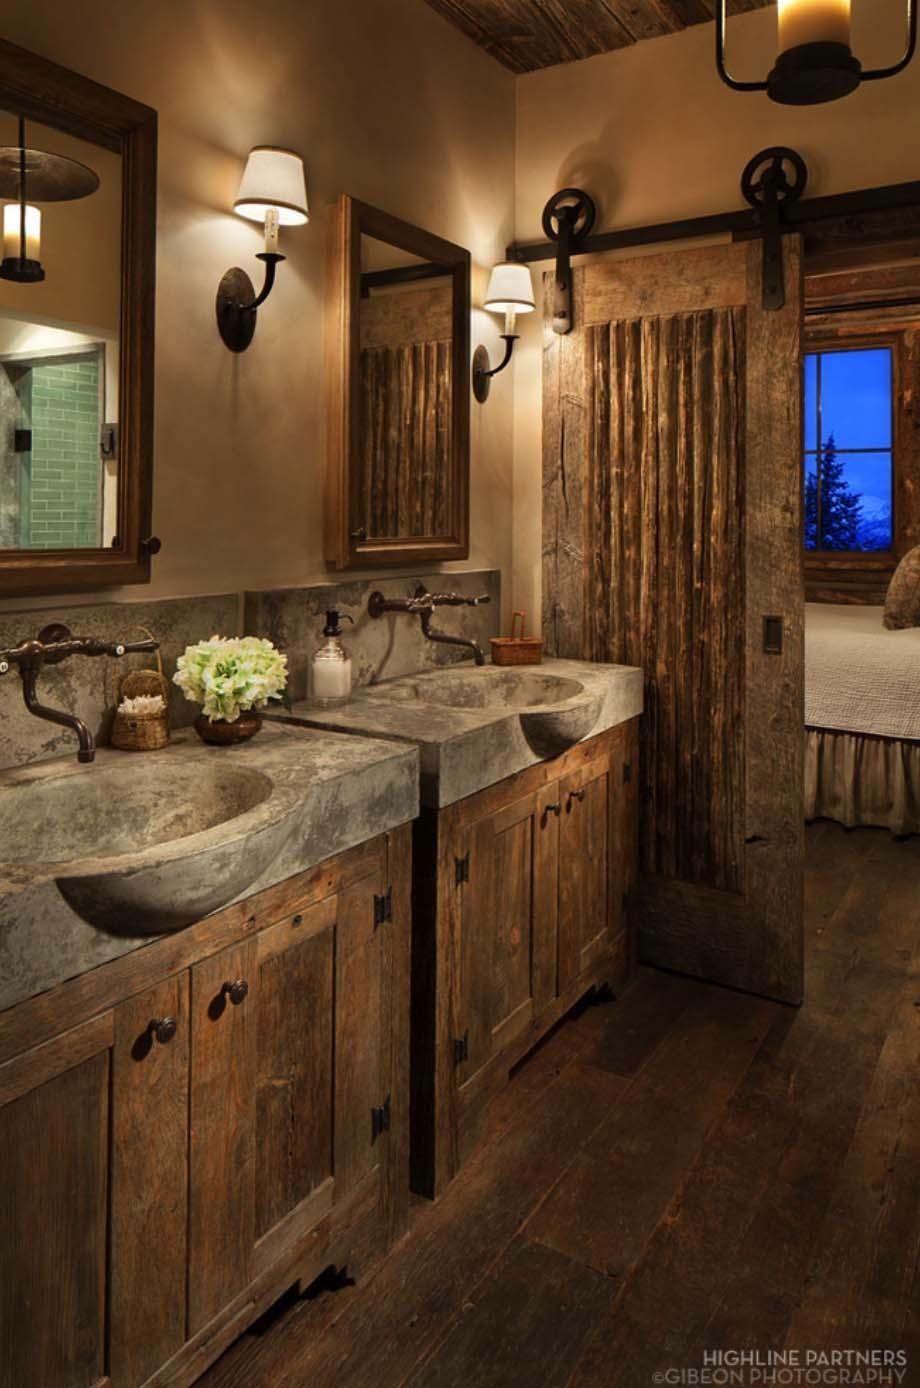 17 Inspiring Rustic Bathroom Decor Ideas For Cozy Home Style Motivation